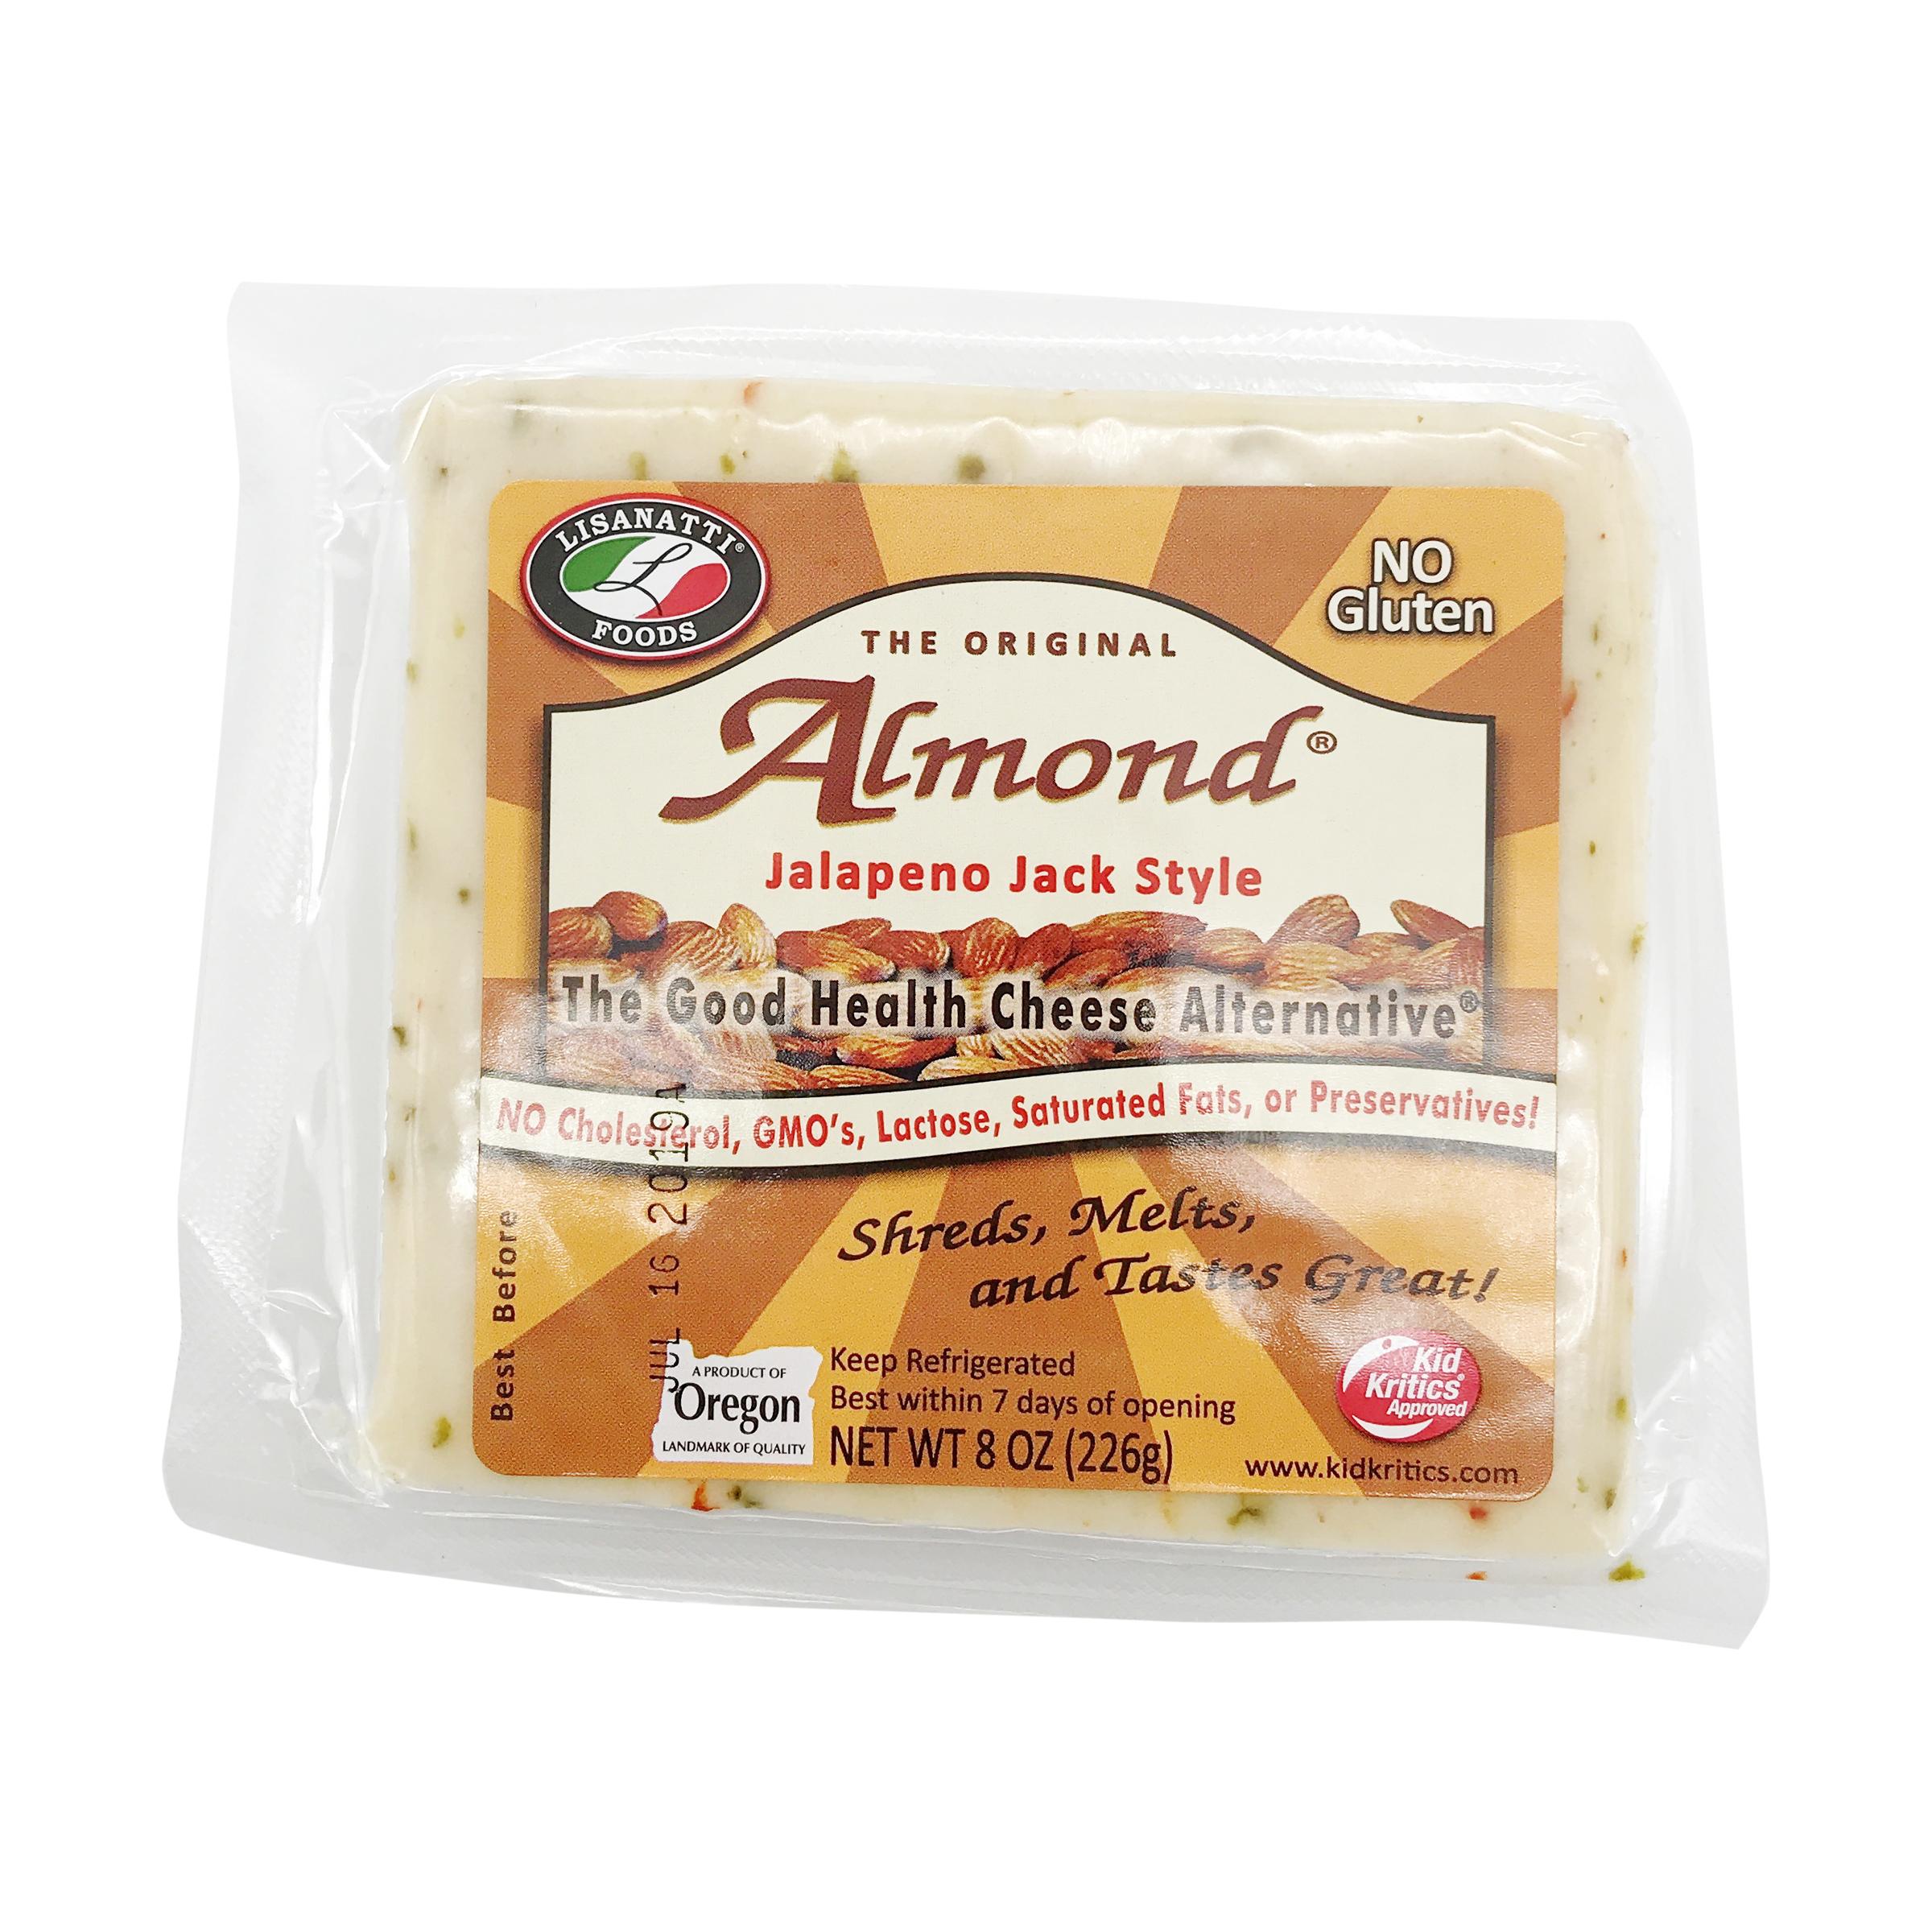 Jalapeno Jack Style Almond Cheese Alternative, 8 oz